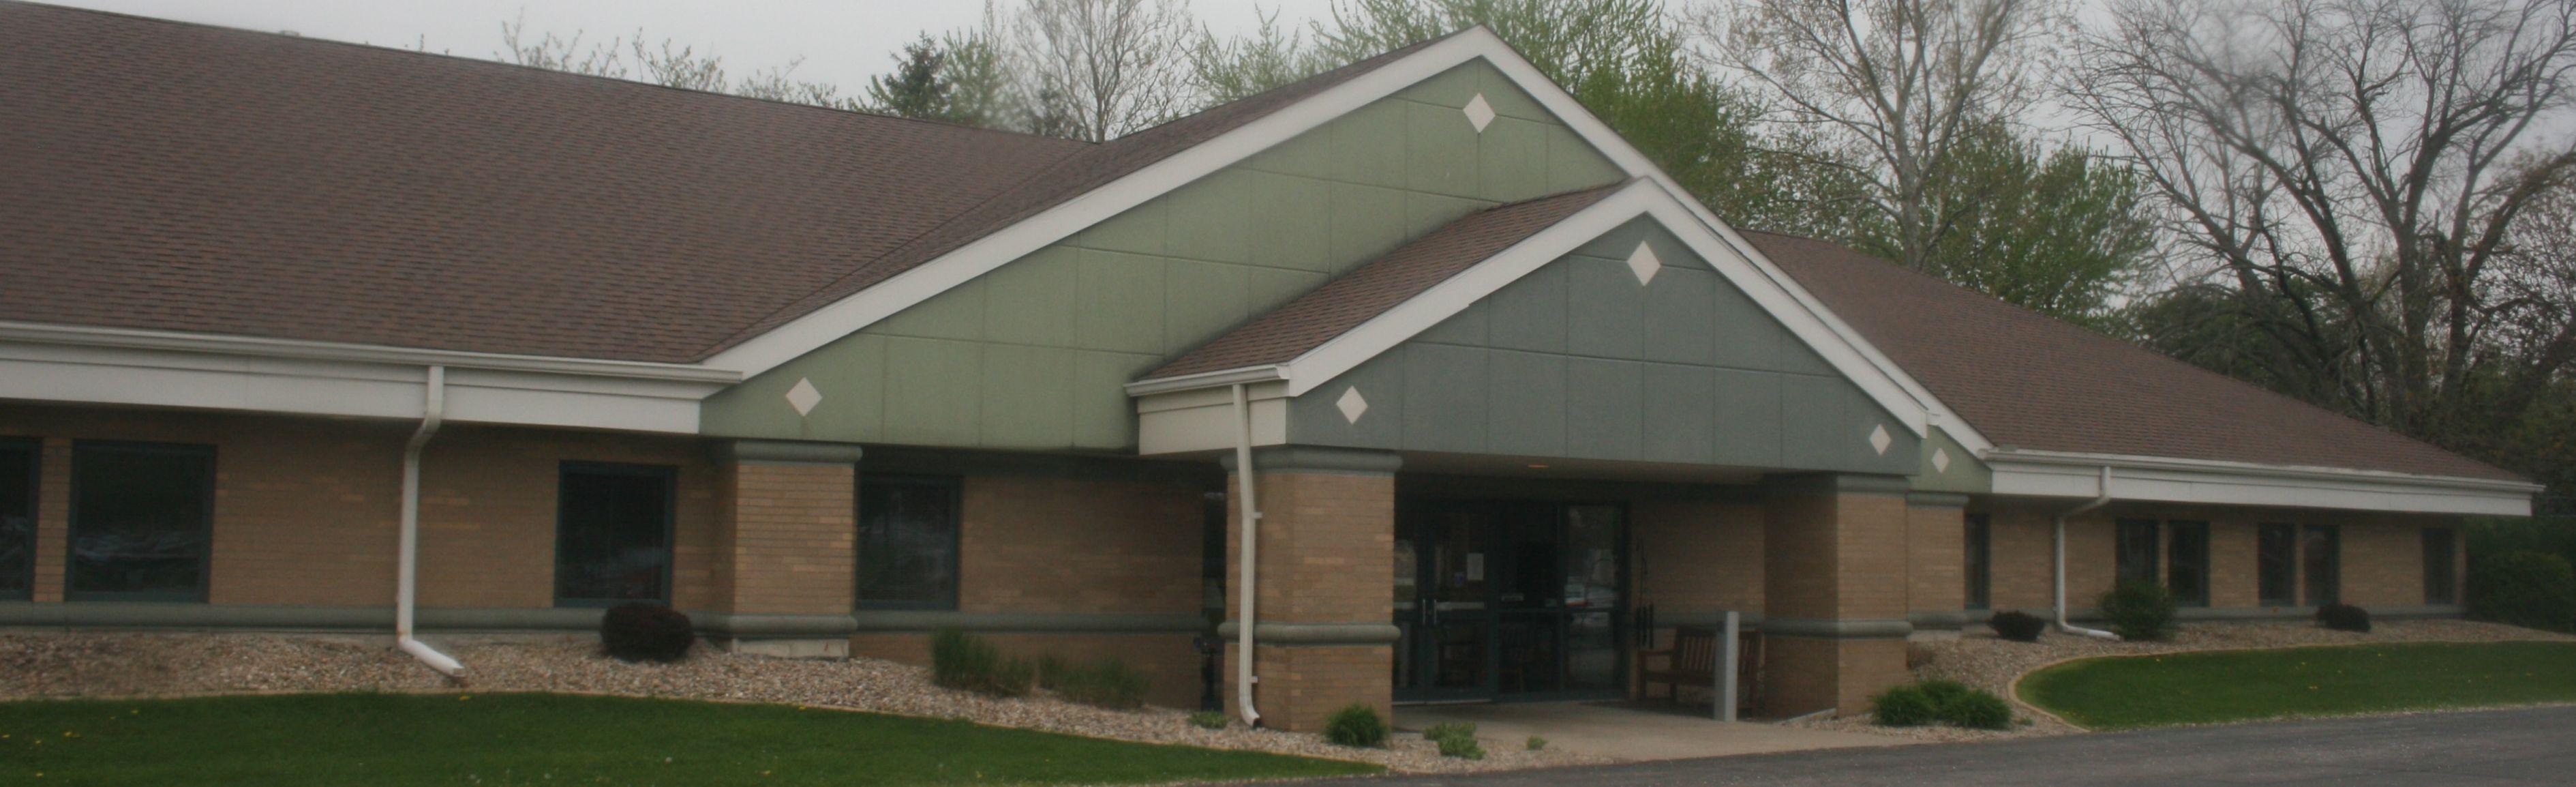 Jasper County Community Services, Inc  - Homepage